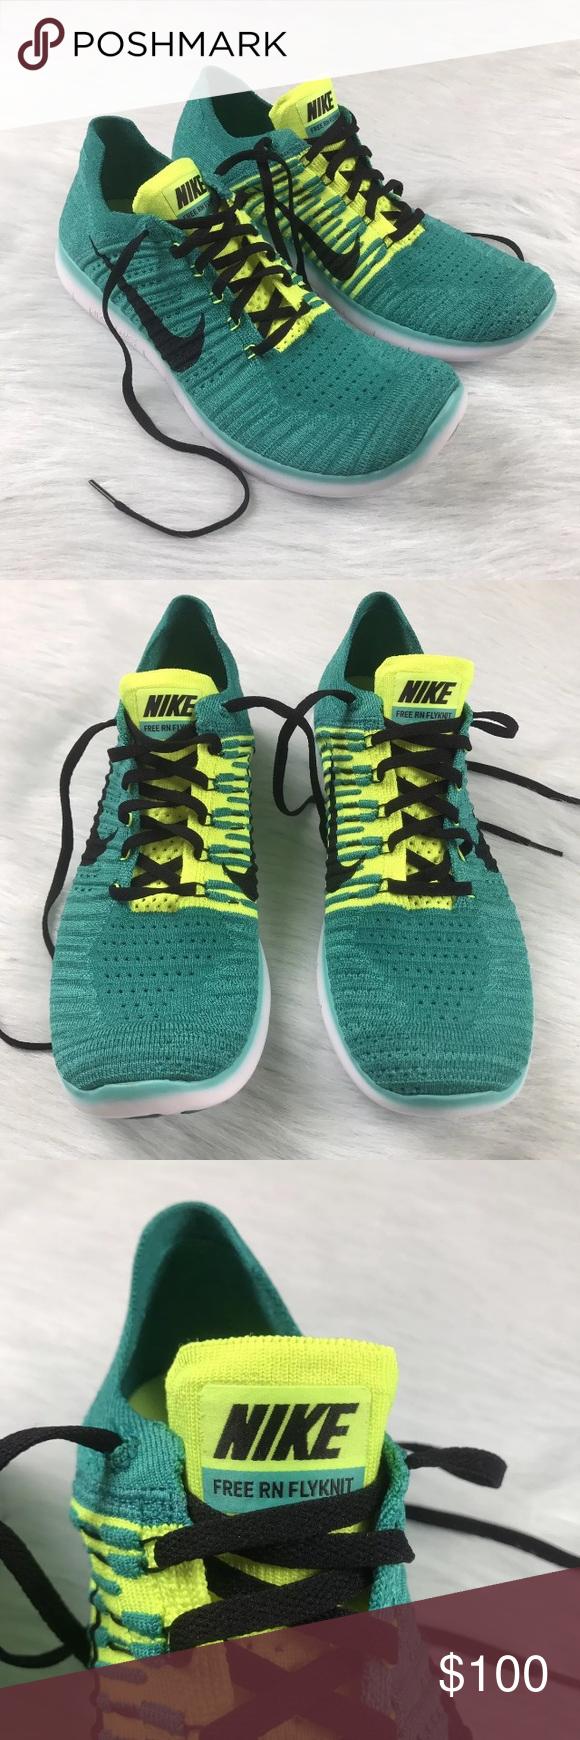 Nike Free Rn Flyknit Running Zapatos Zapatillas Sz Nike 11 Hombres Size 11 Nike Sz 879e17